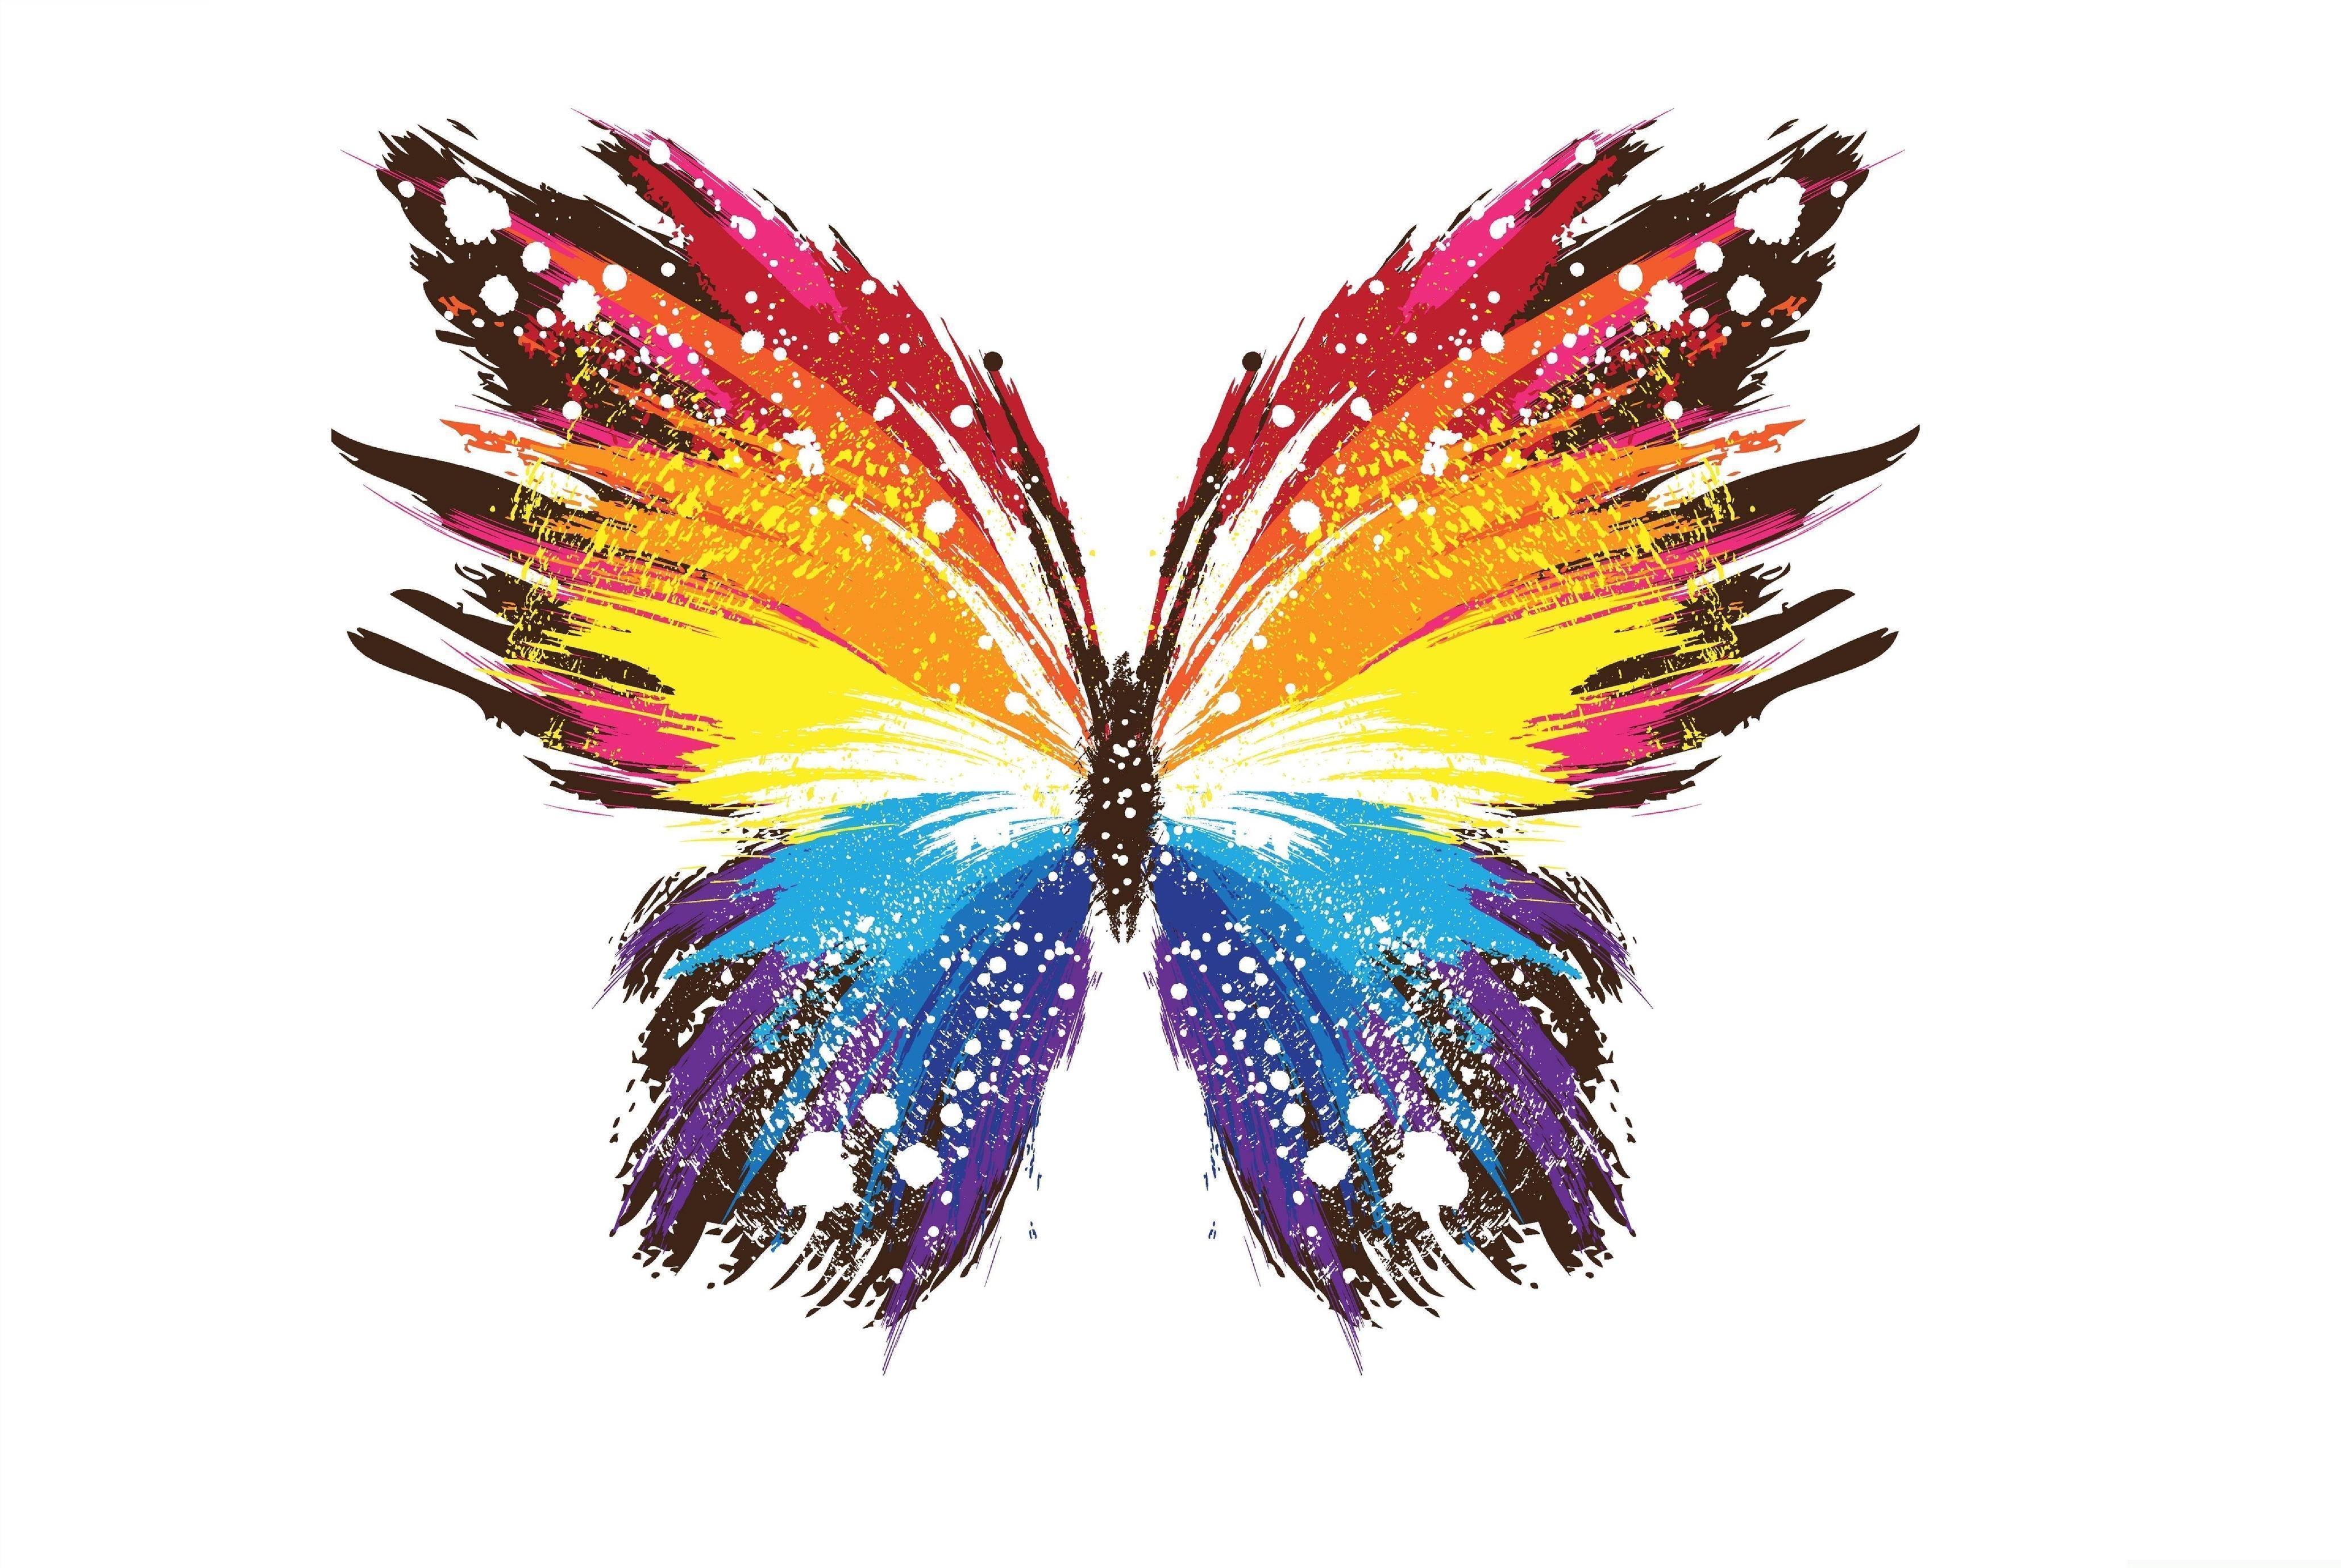 hd rainbow butterfly wallpaper - photo #21